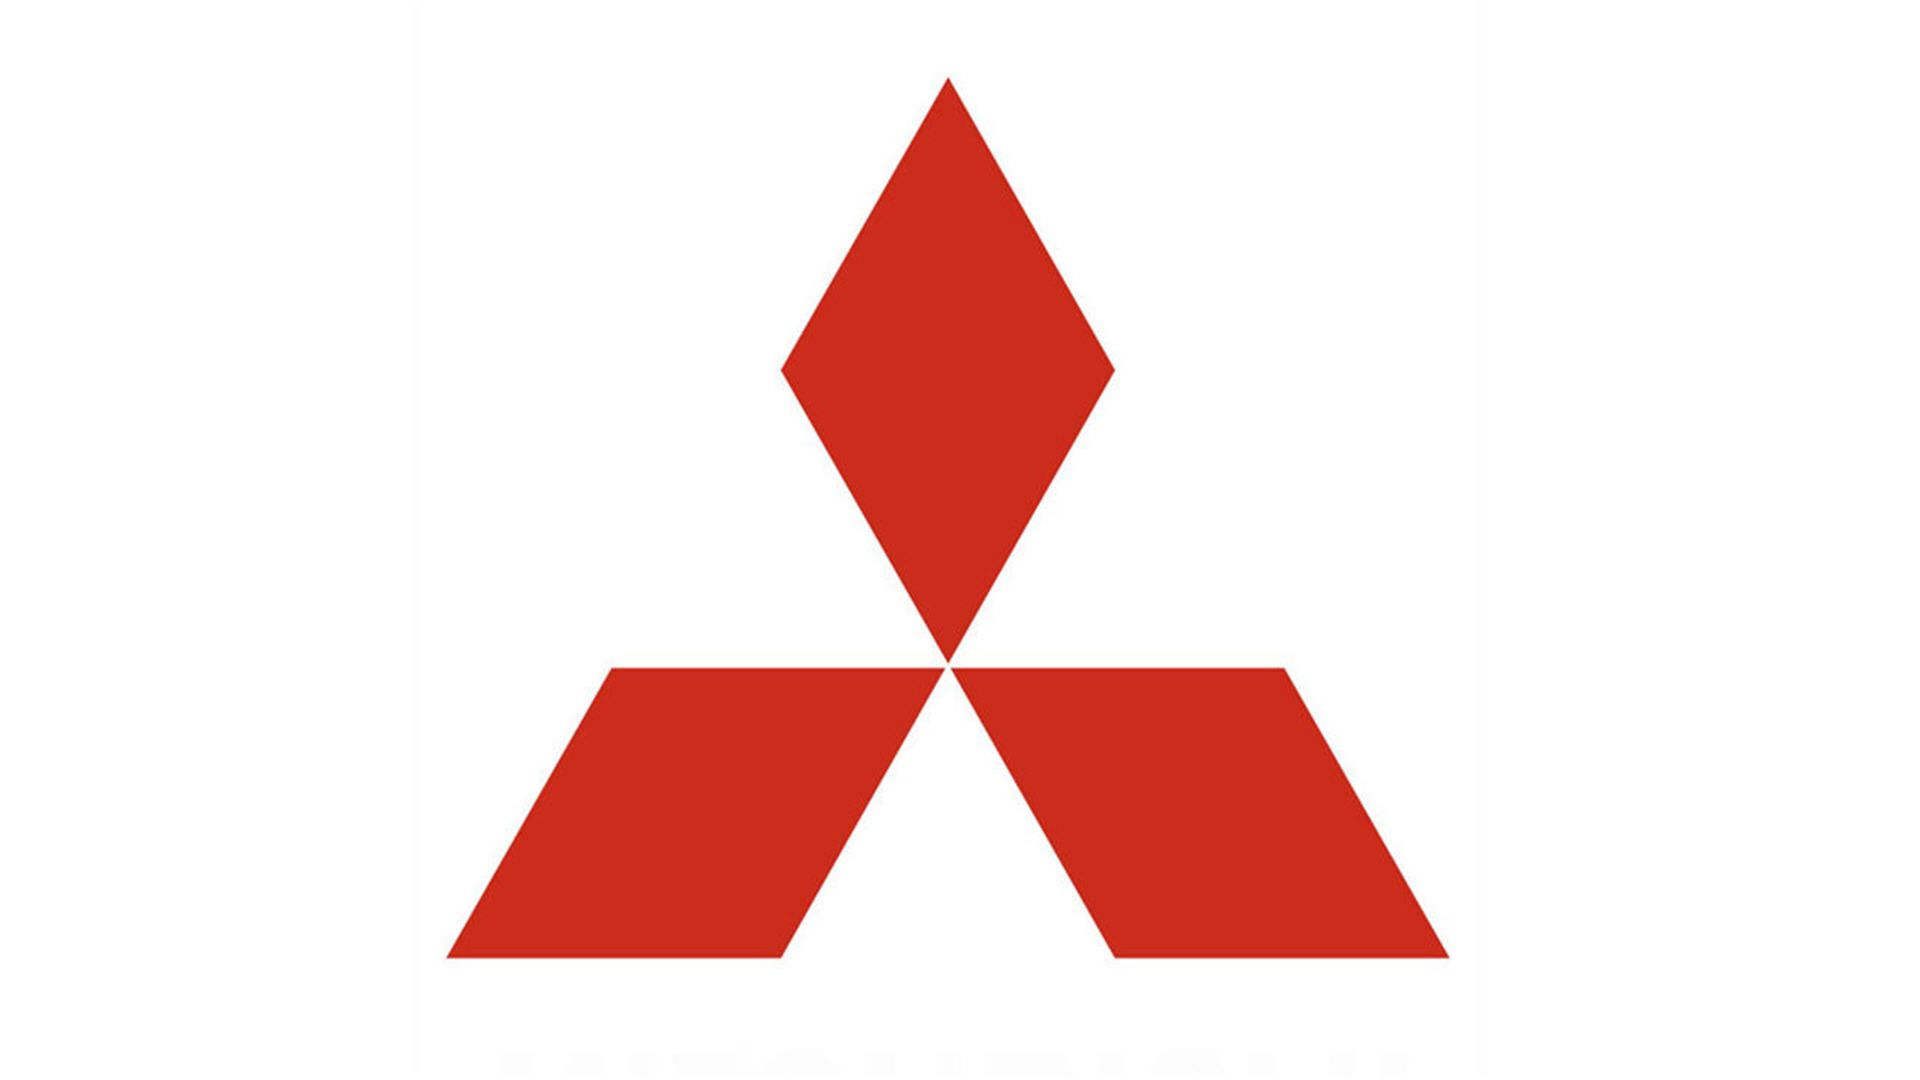 Mitsubishi Logo Hd Wallpaper Car Wallpapers Hd Wallpaper Mitsubishi Emblem Logo